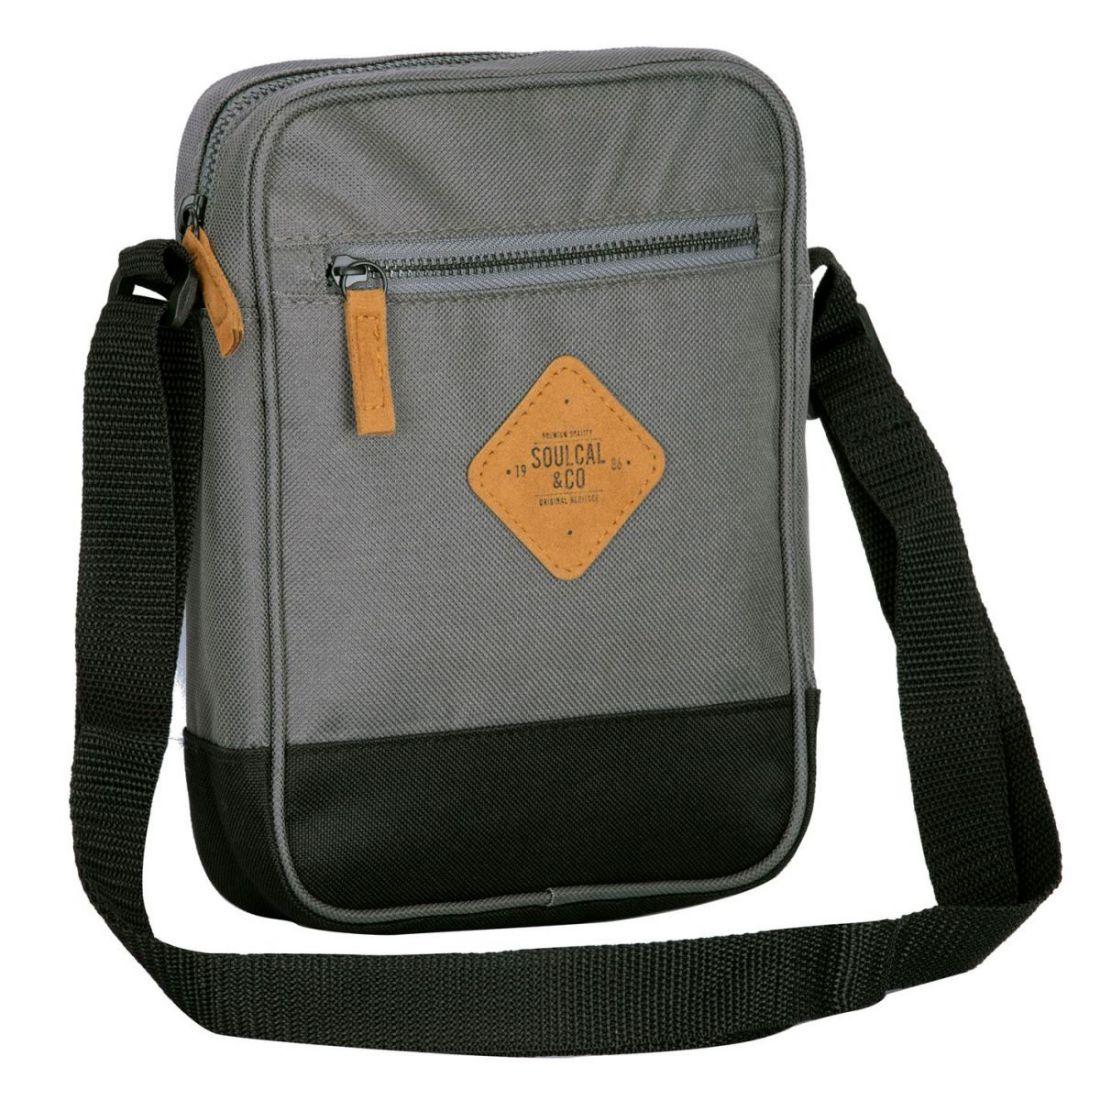 Unisex-SoulCal-Mini-Gadget-Bag-Zip-New